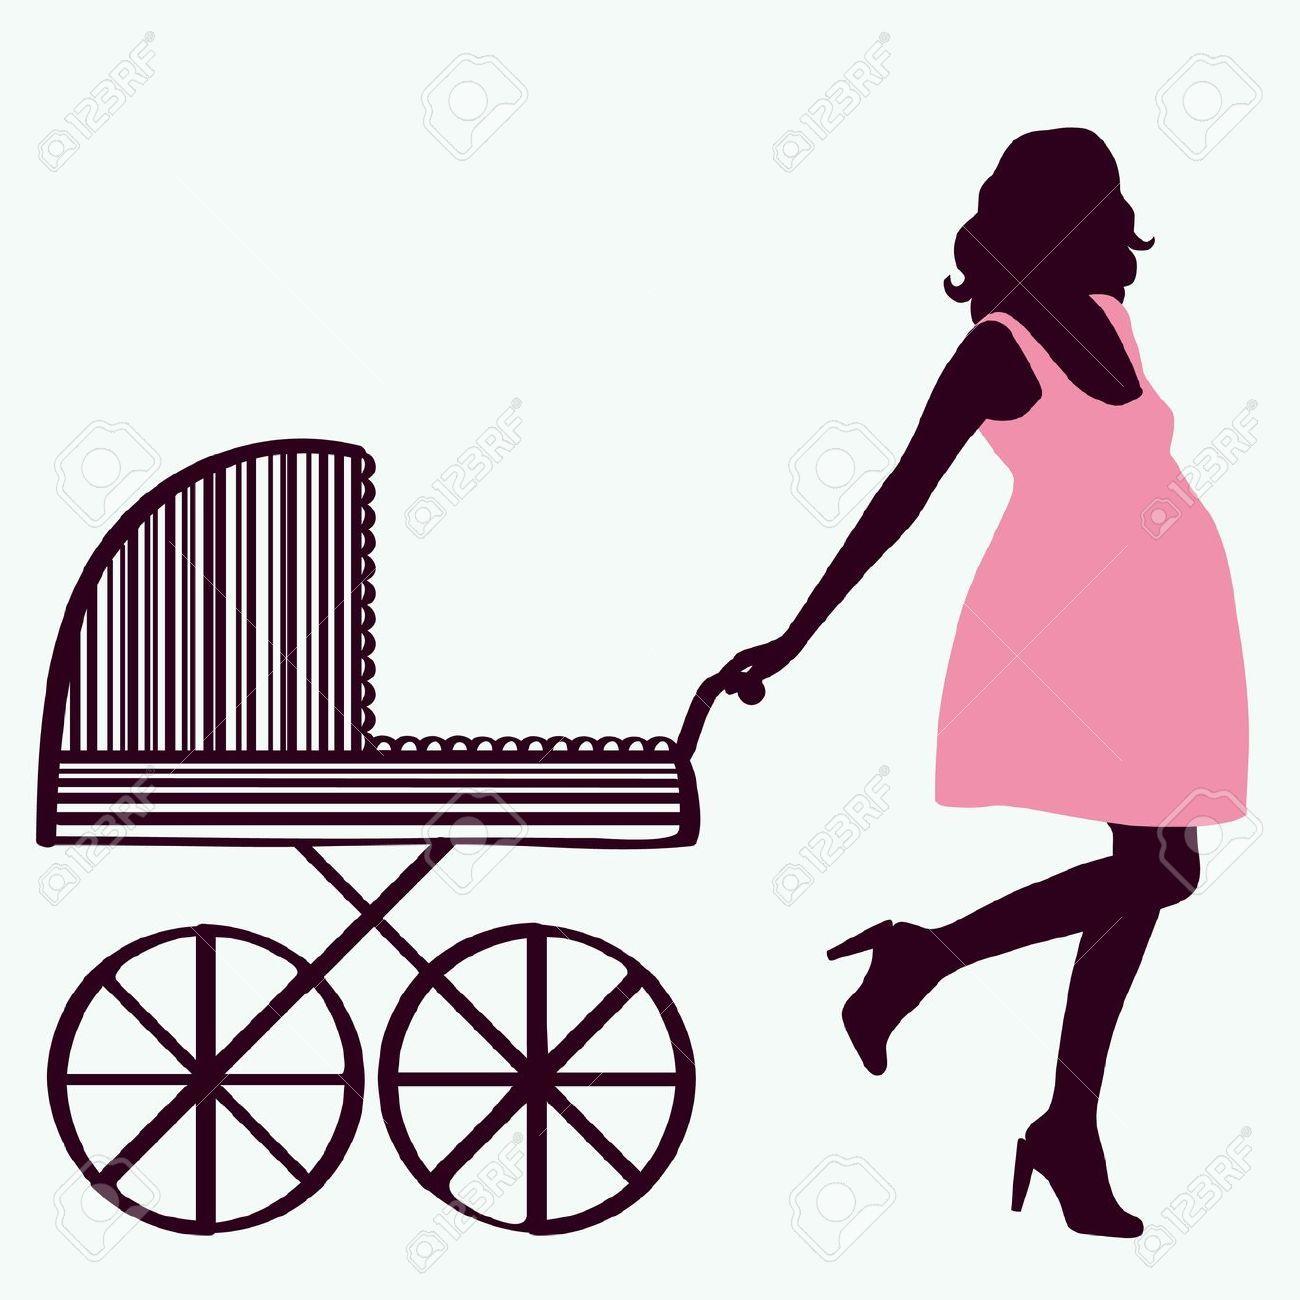 Silhouette Pregnant Woman With Umbrella